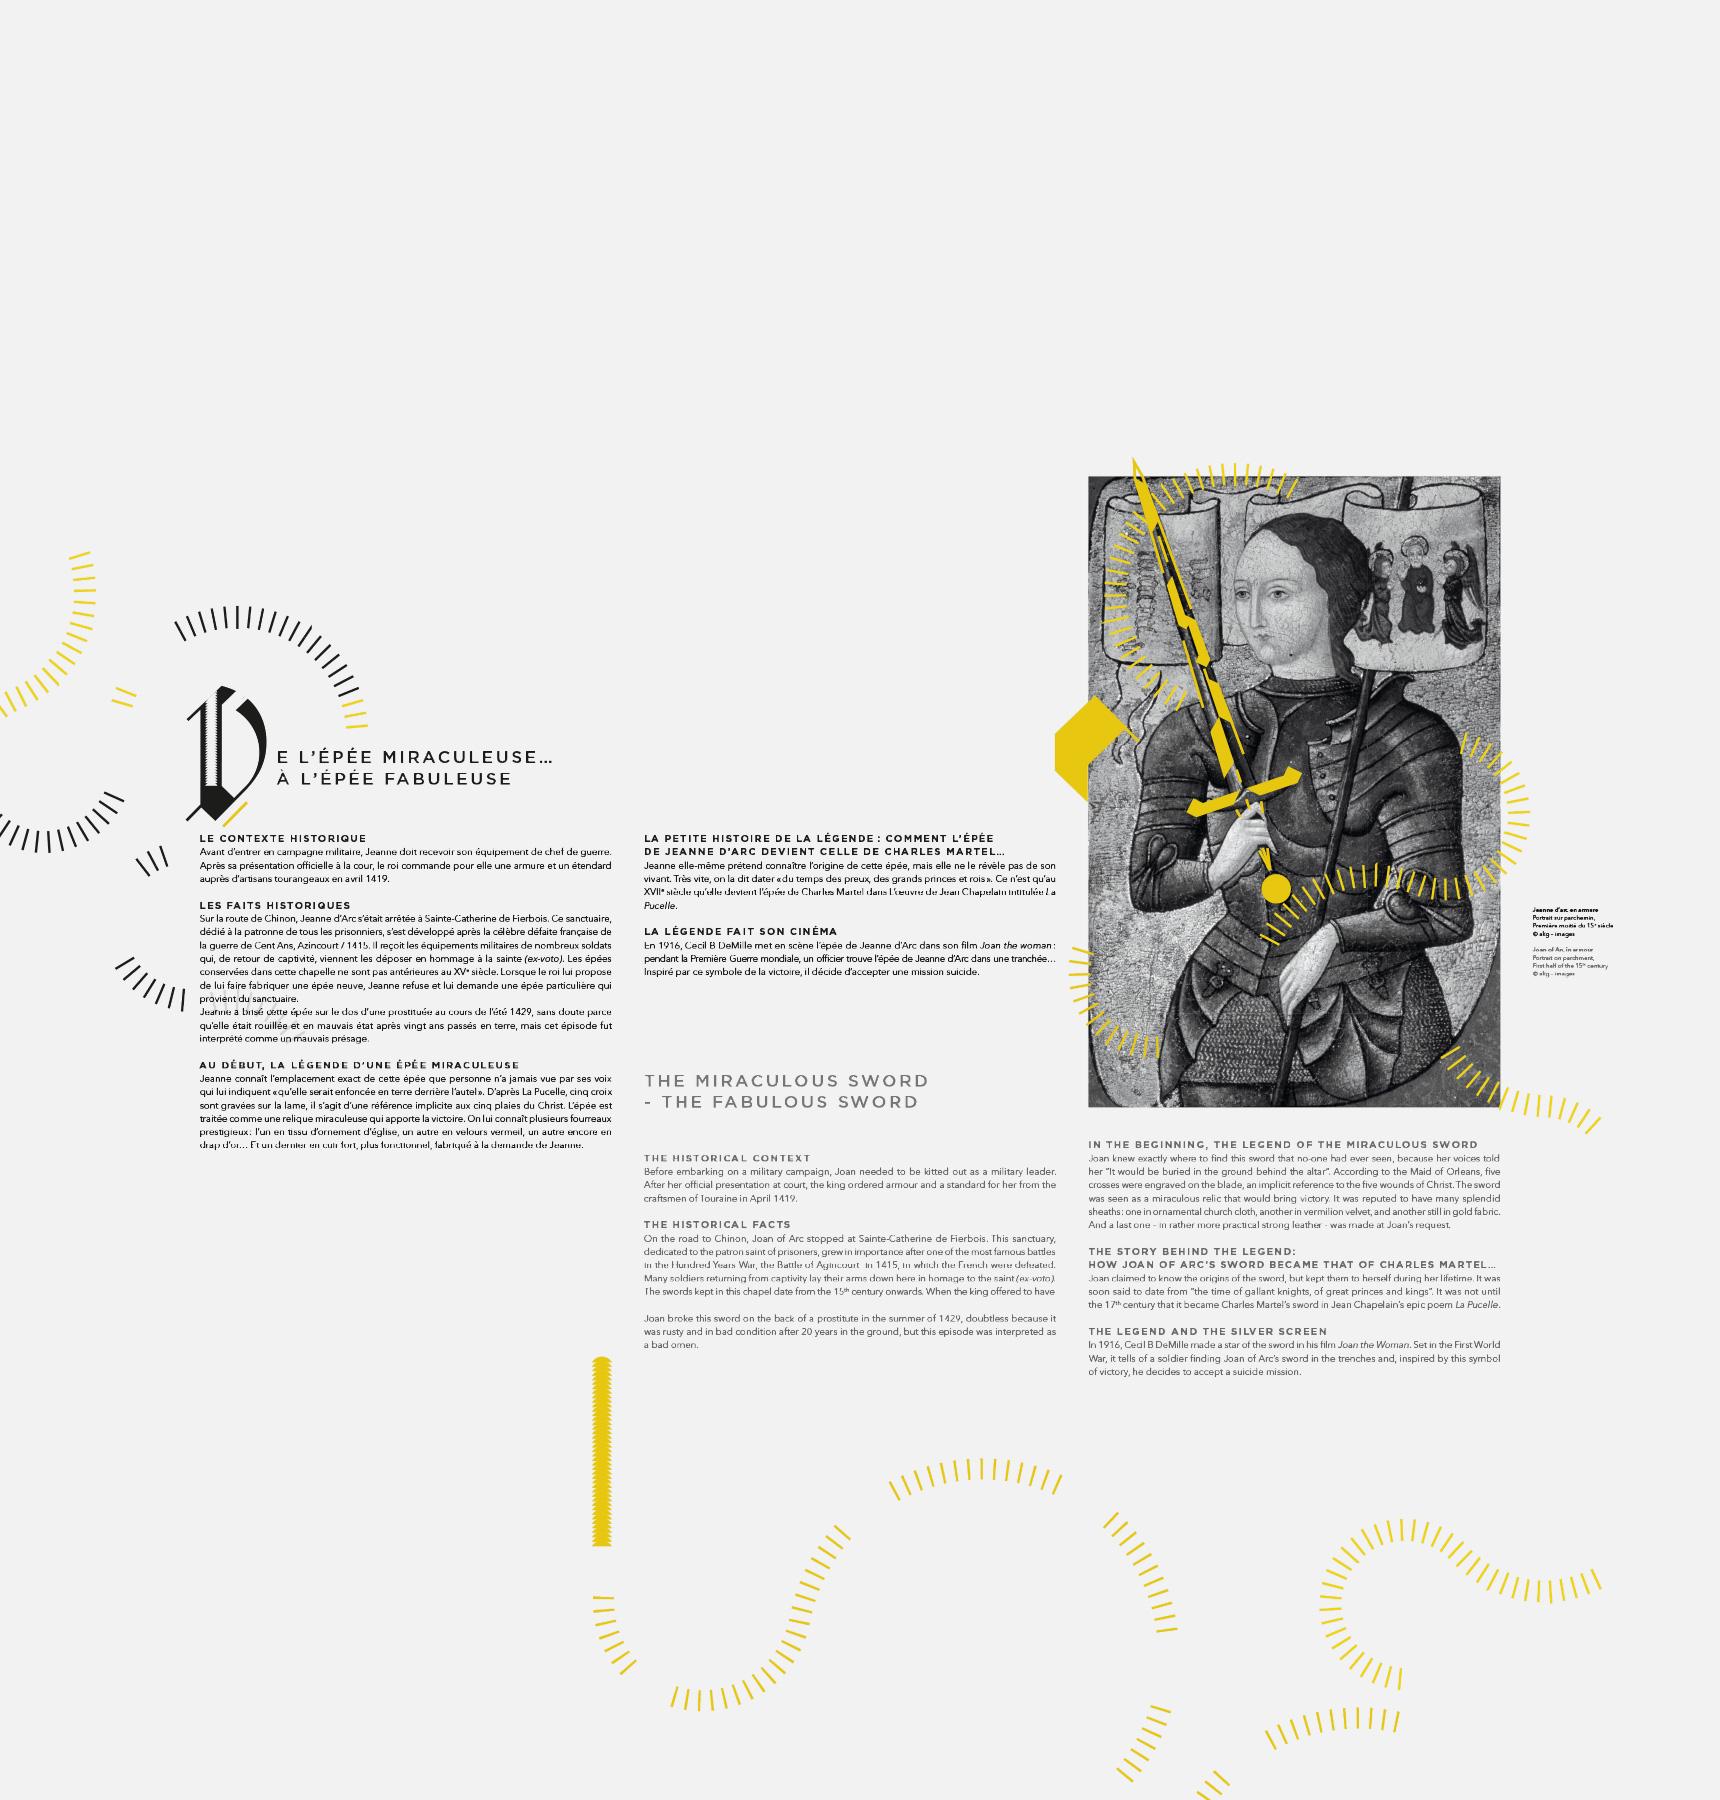 Epok-design-exposition-mythes-et-legendes-Chinon-v02B